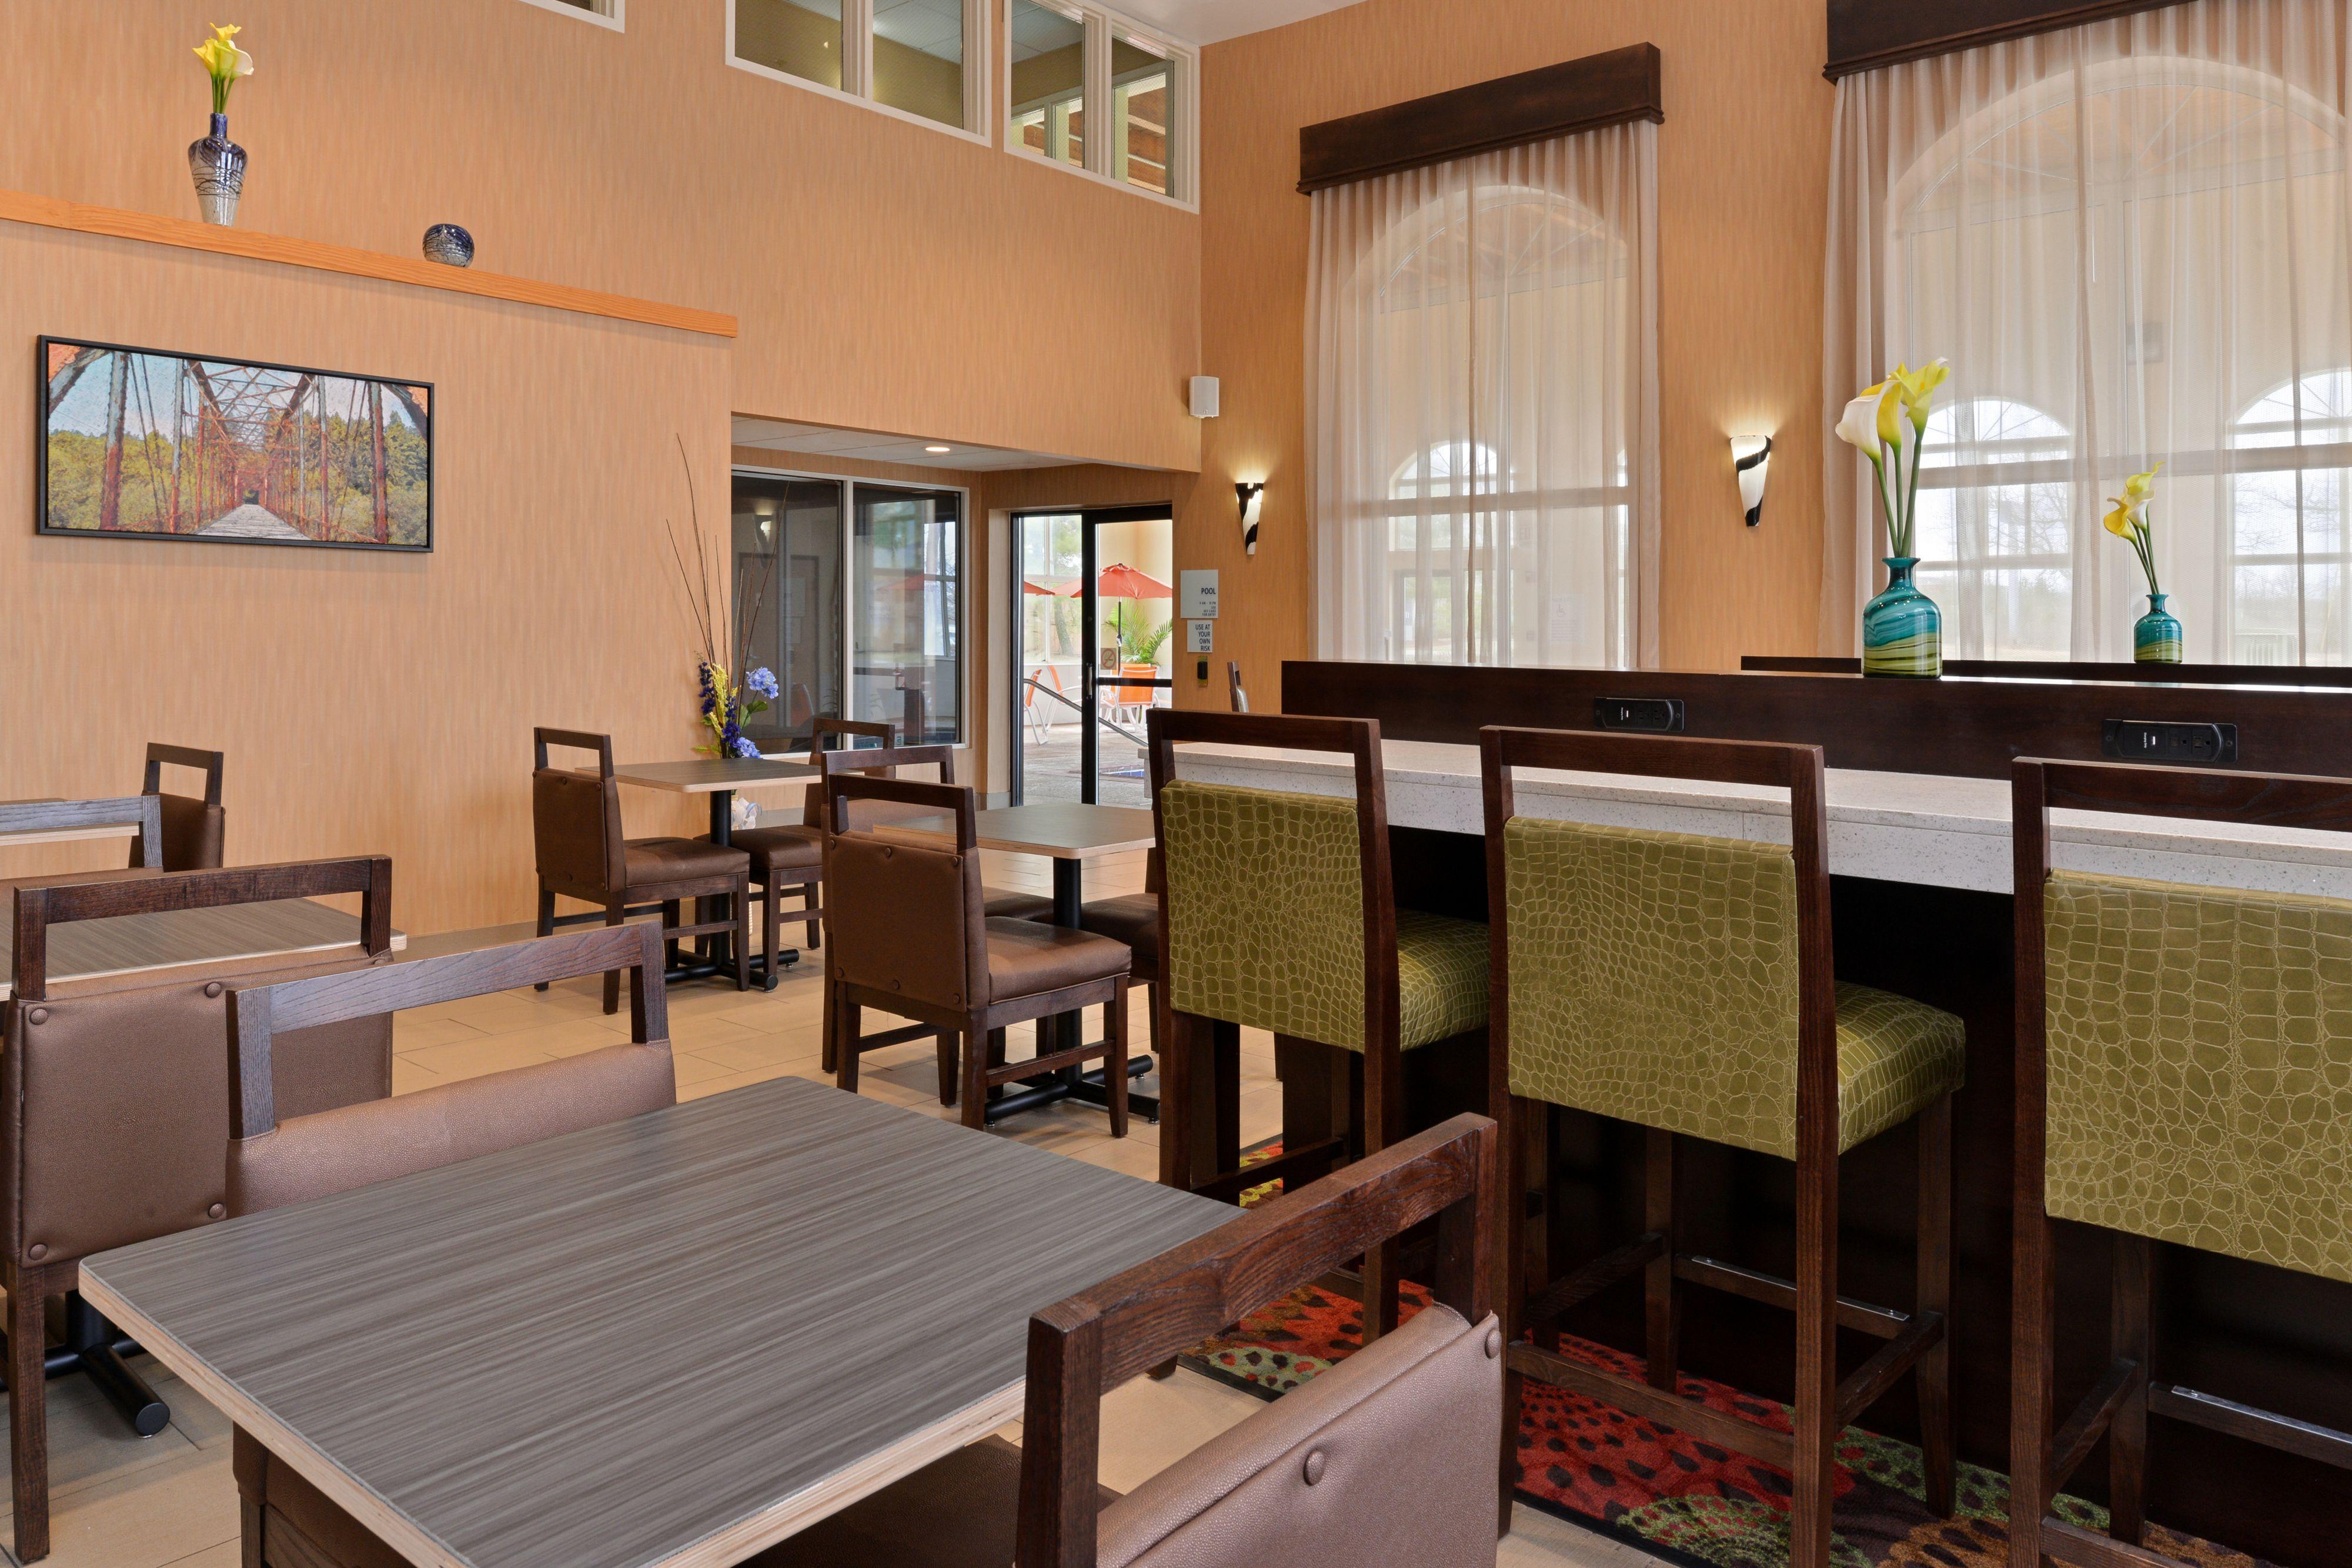 Holiday Inn Express Cincinnati-N/Sharonville image 5